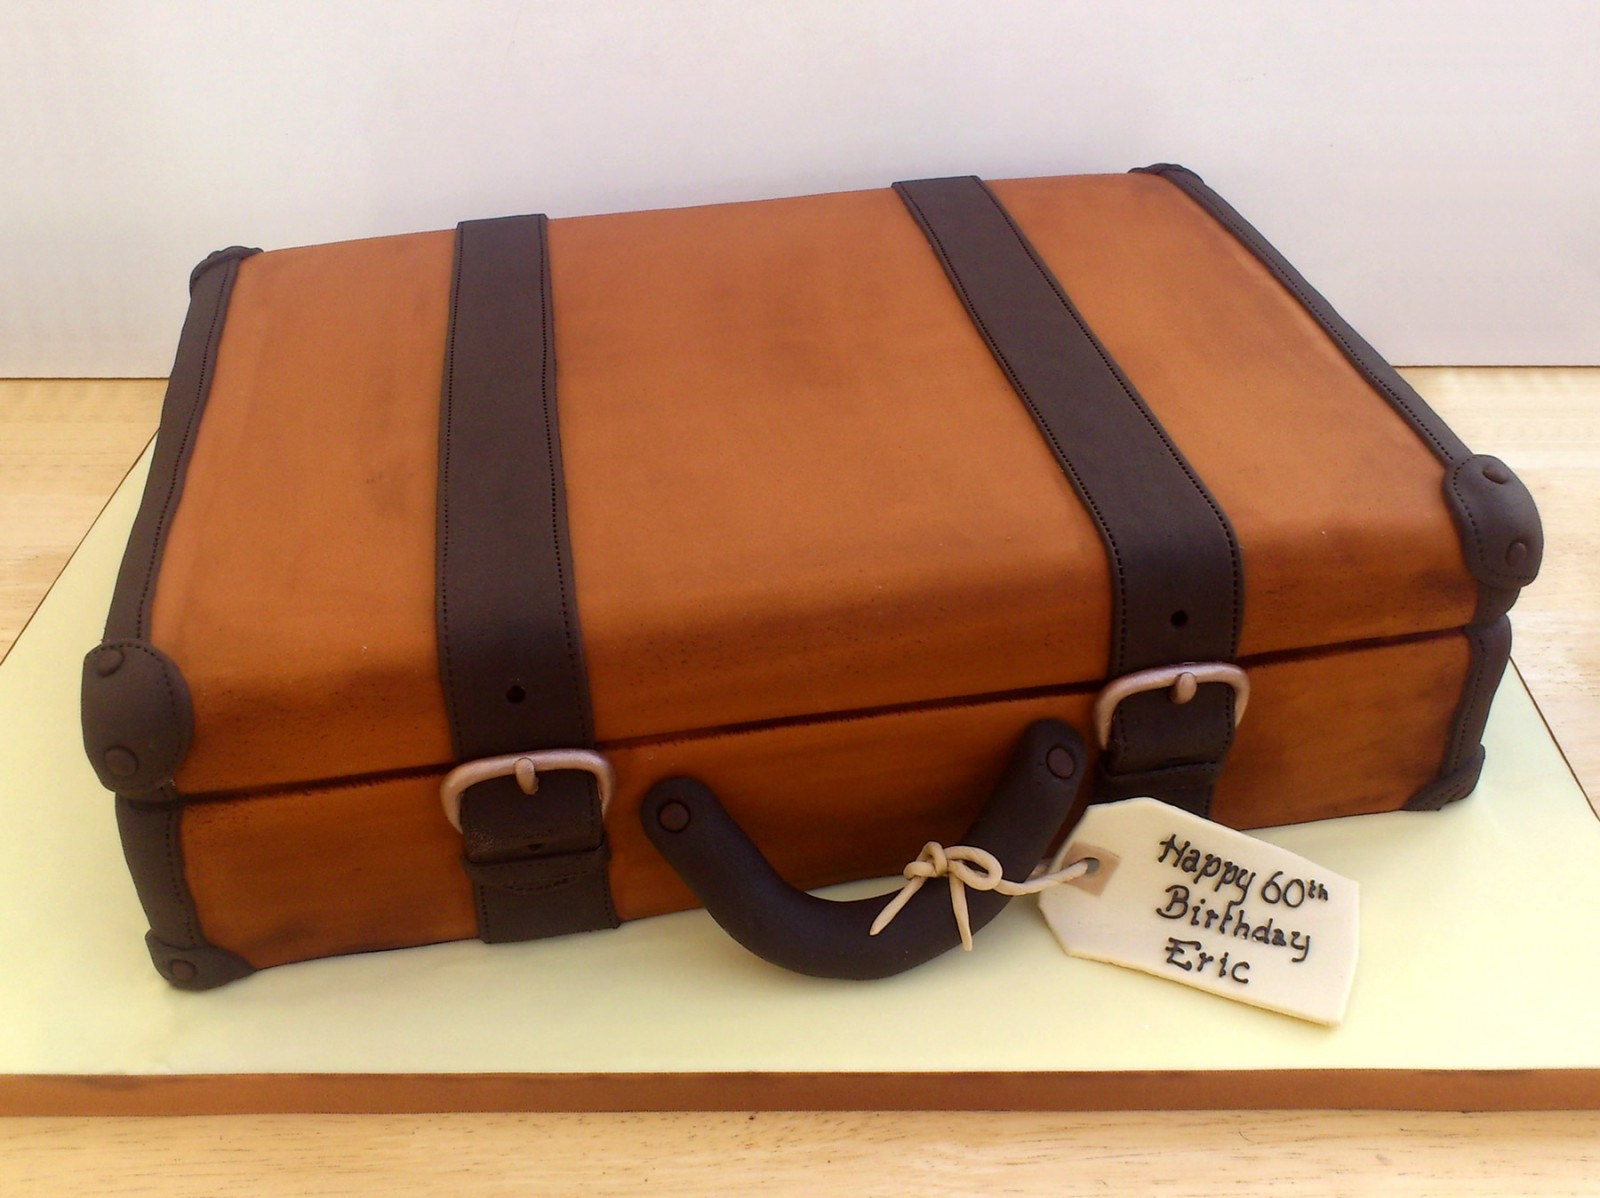 Vintage Suitcase Wedding Cakes